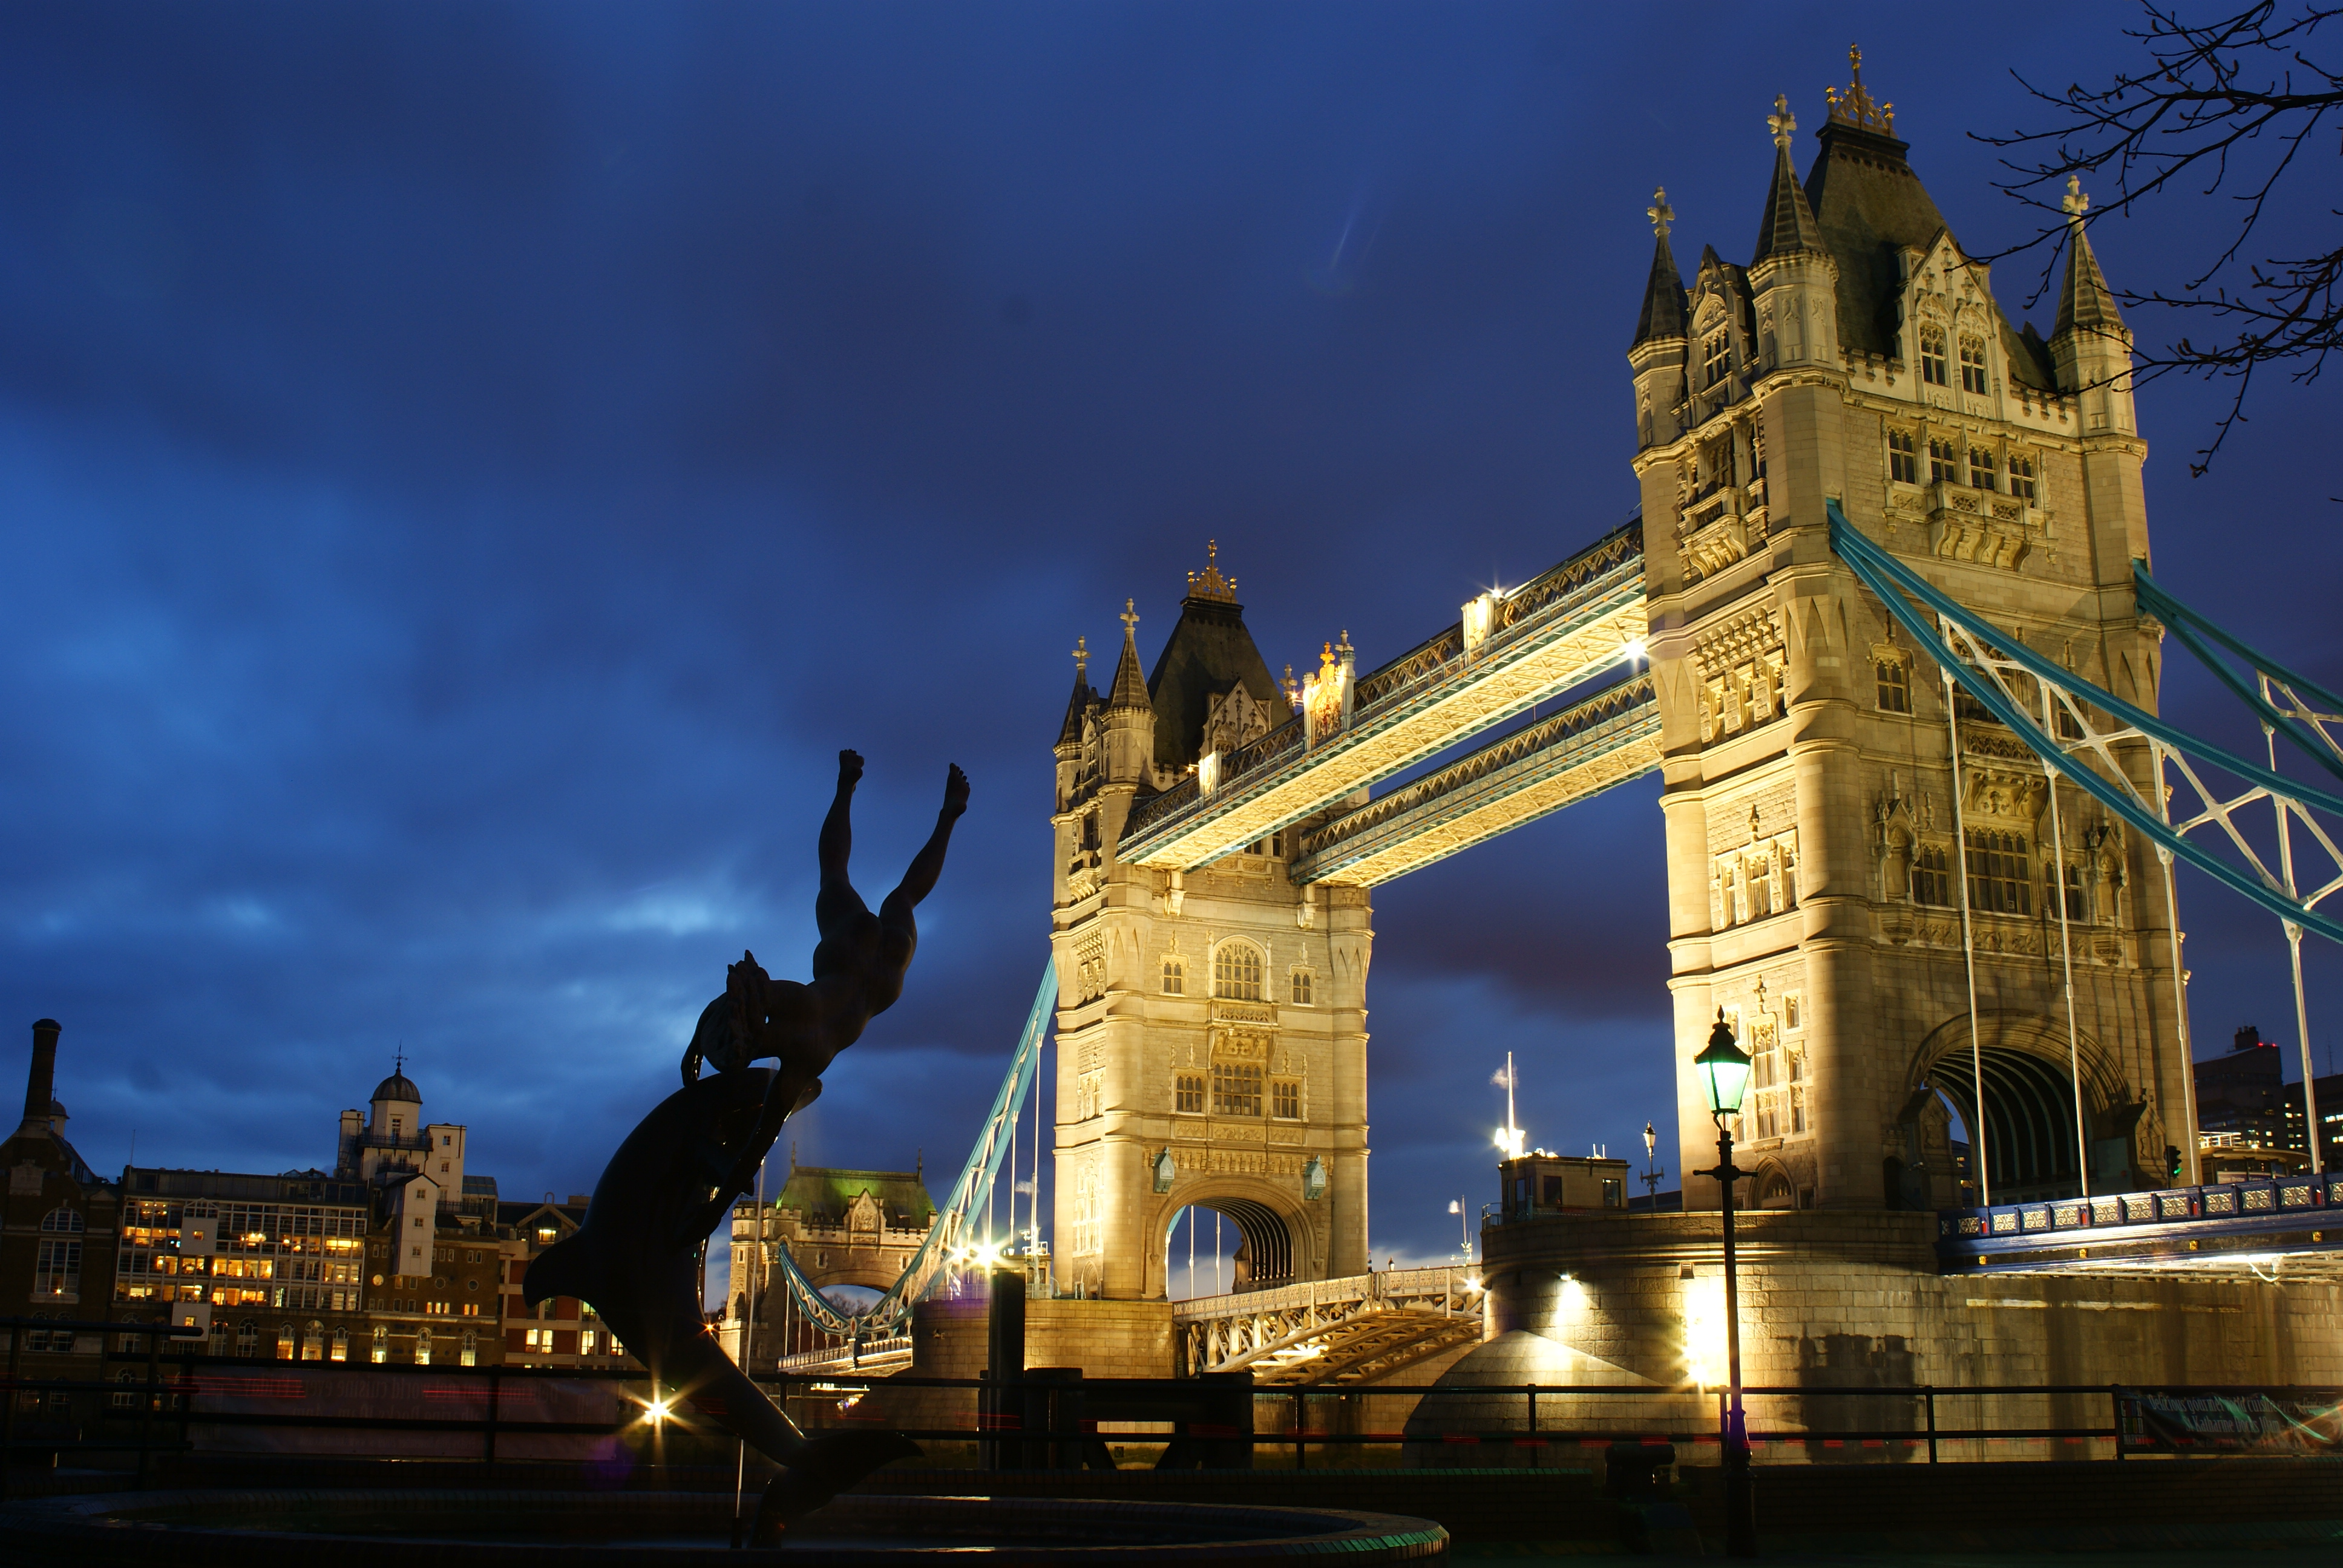 Earth Desktop Wallpaper Hd File Girl With A Dolphin Tower Bridge London Geograph